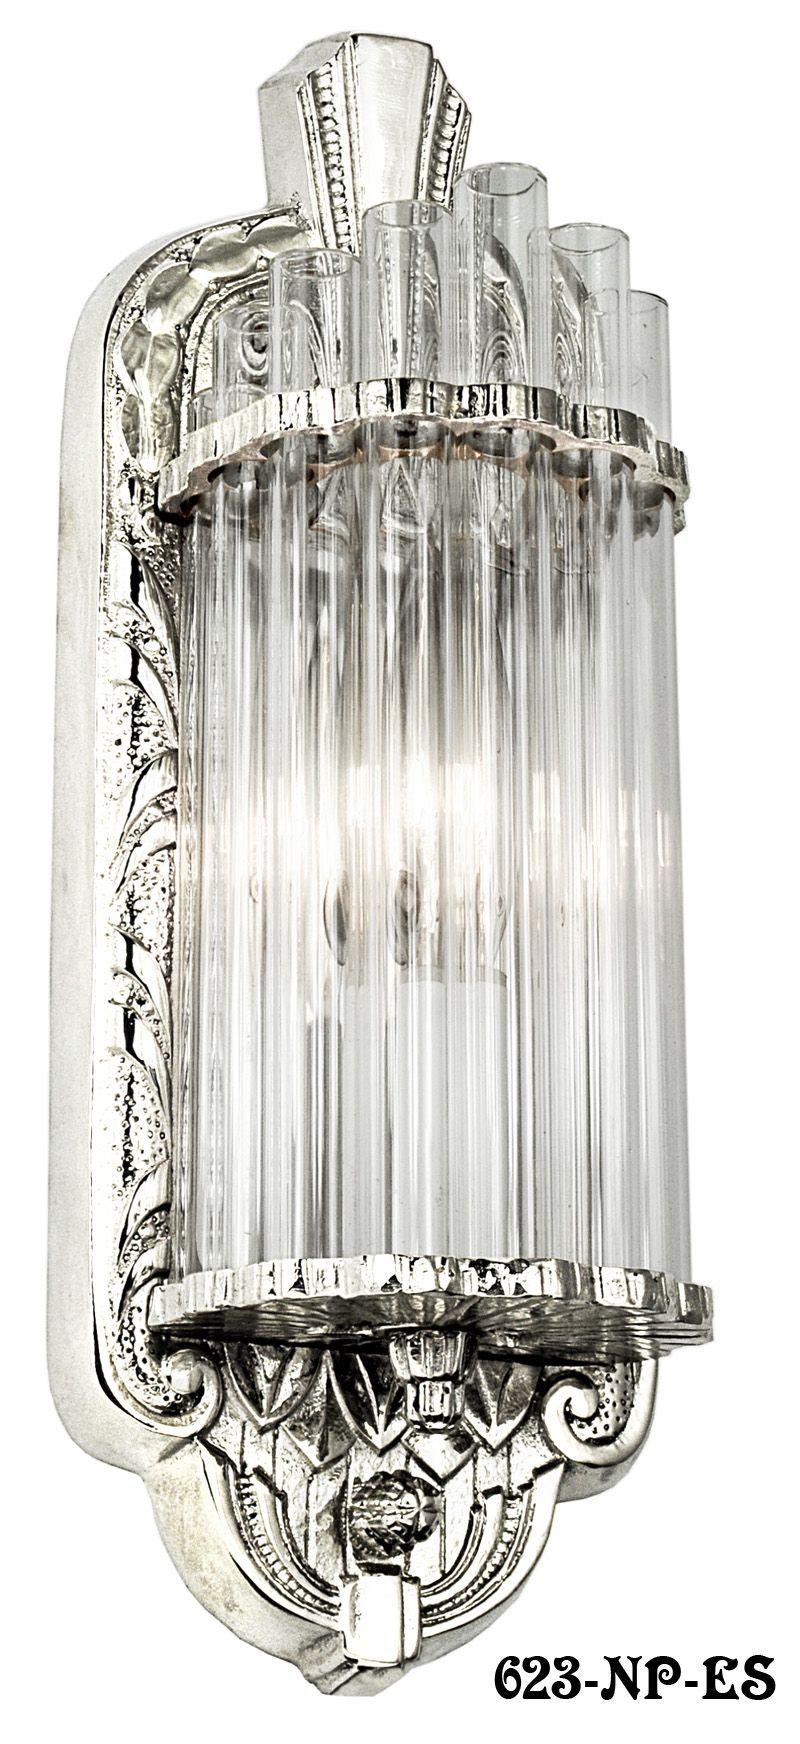 Vintage Art Deco Slip Shade Wall Sconces Free Shipping To Usa Etsy Vintage Art Deco Vintage Art Sconces